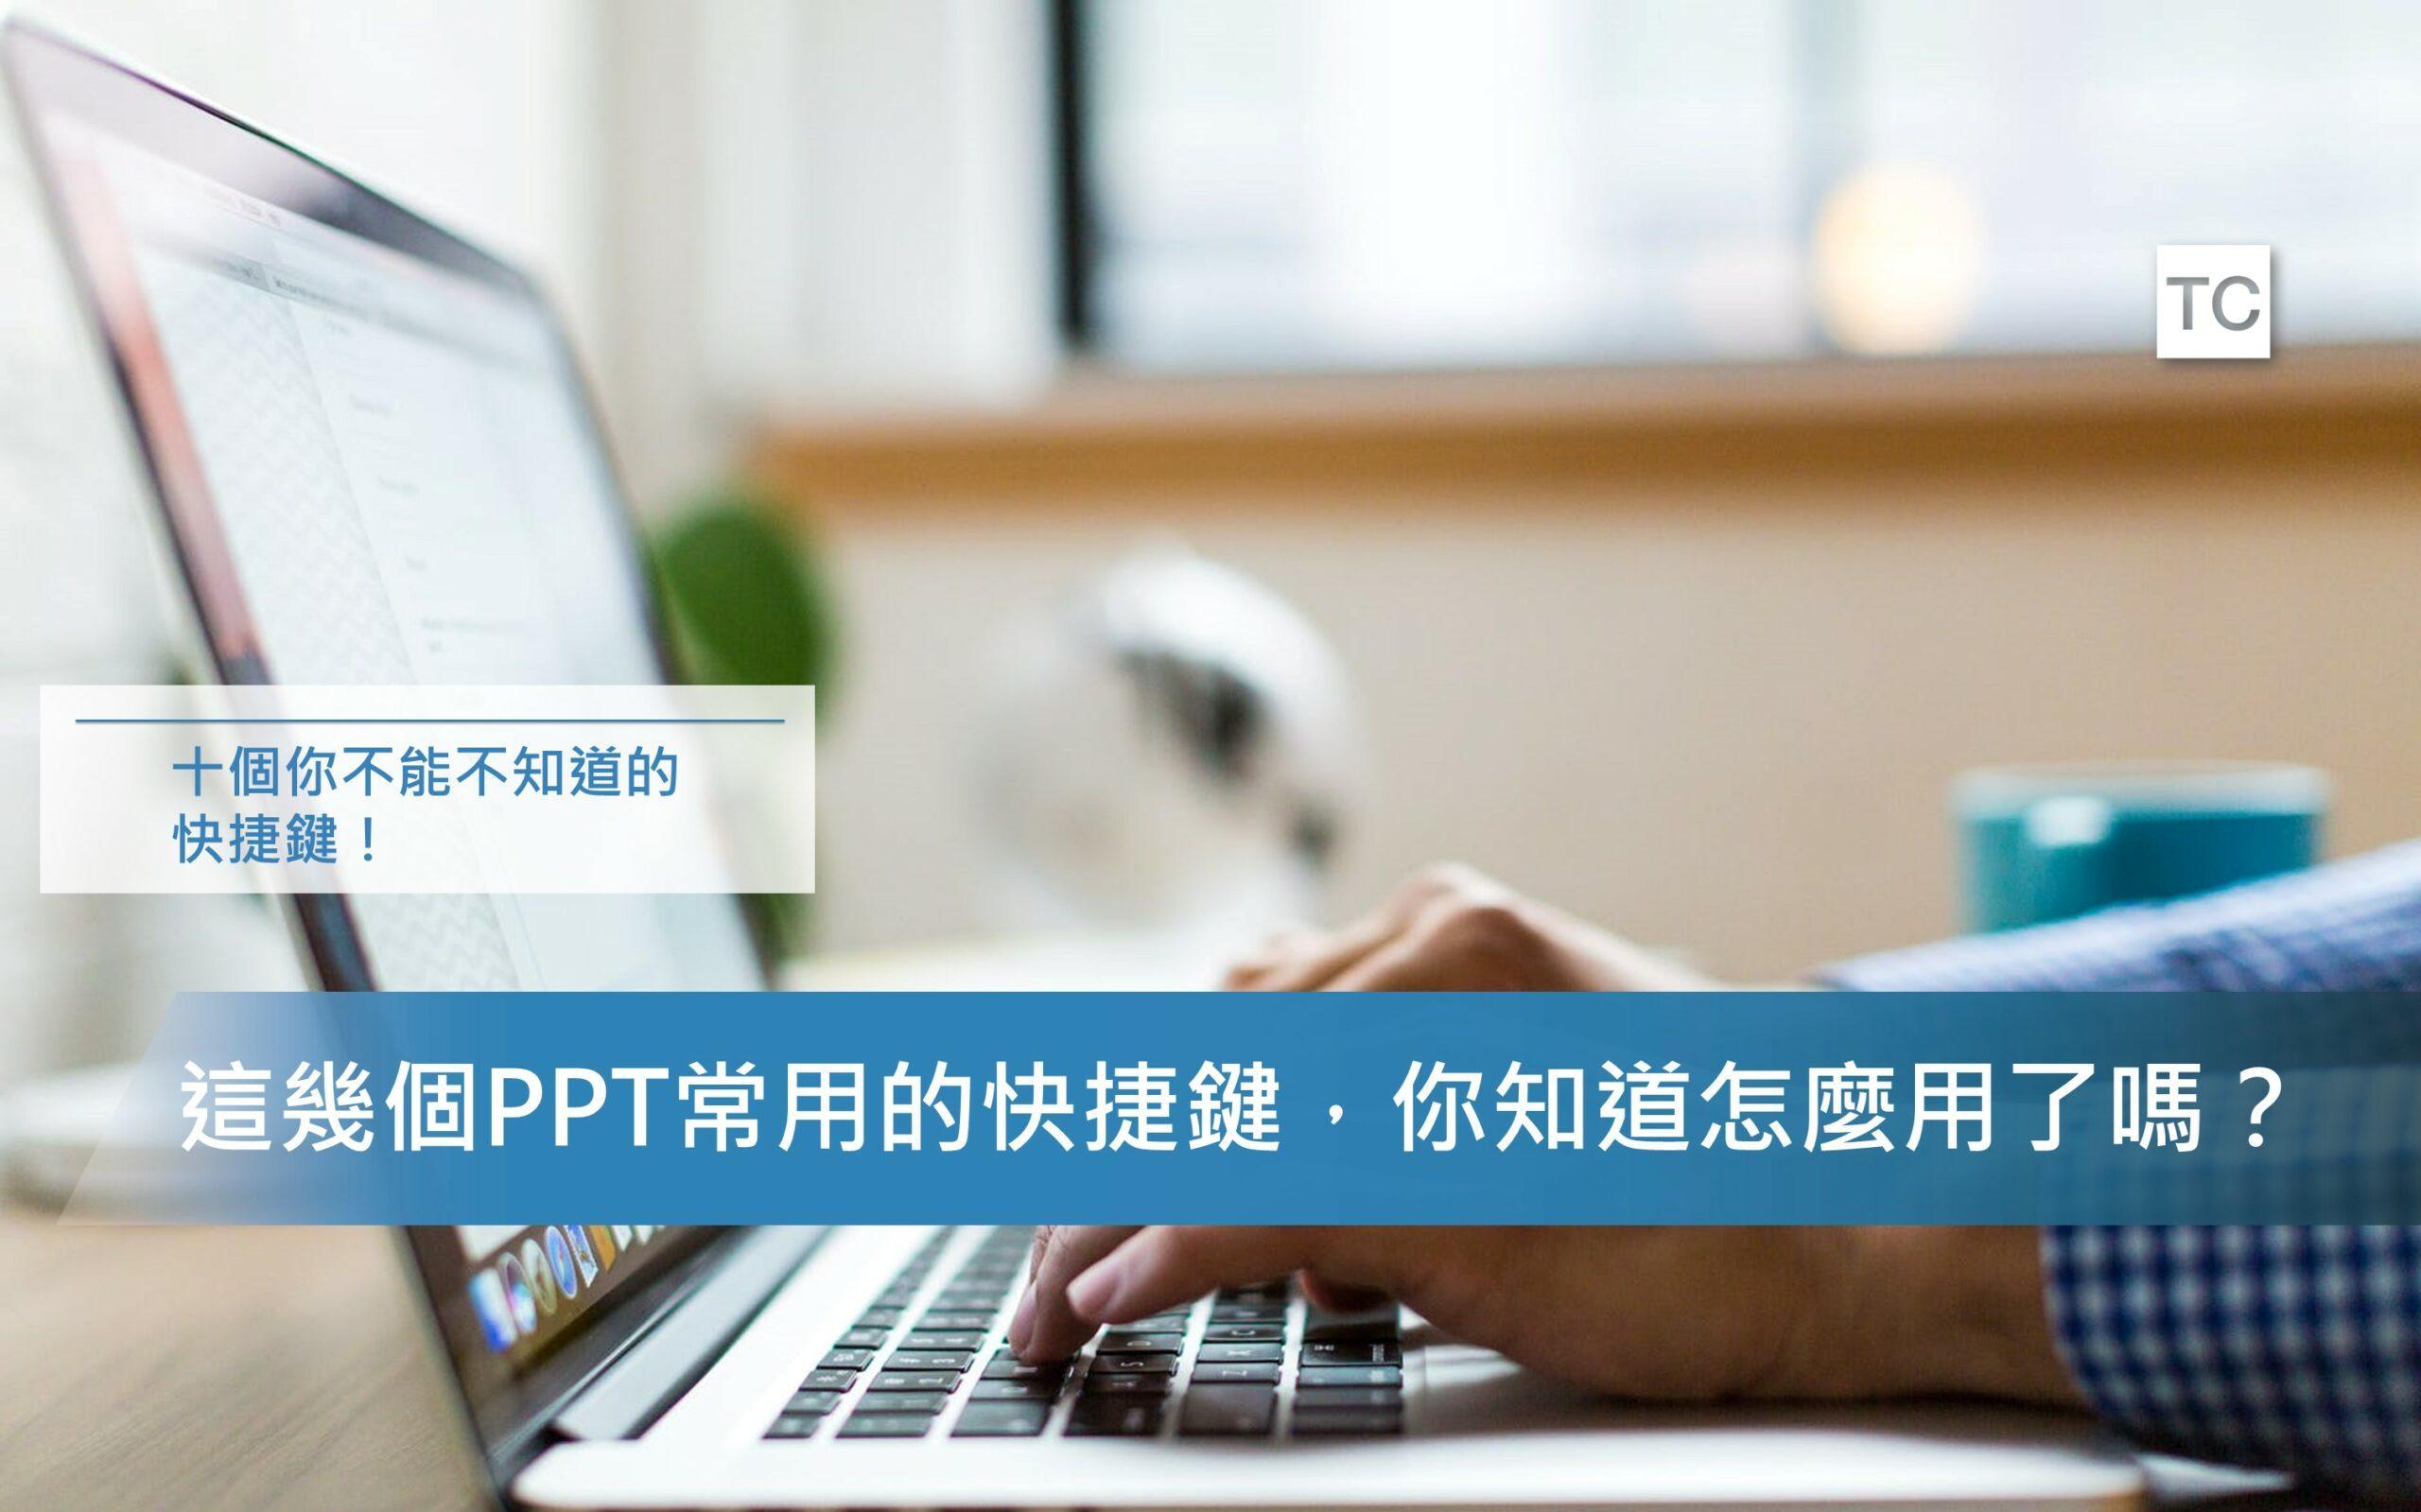 PPT教學|這幾個常用的PPT快捷鍵,你還不知道嗎?